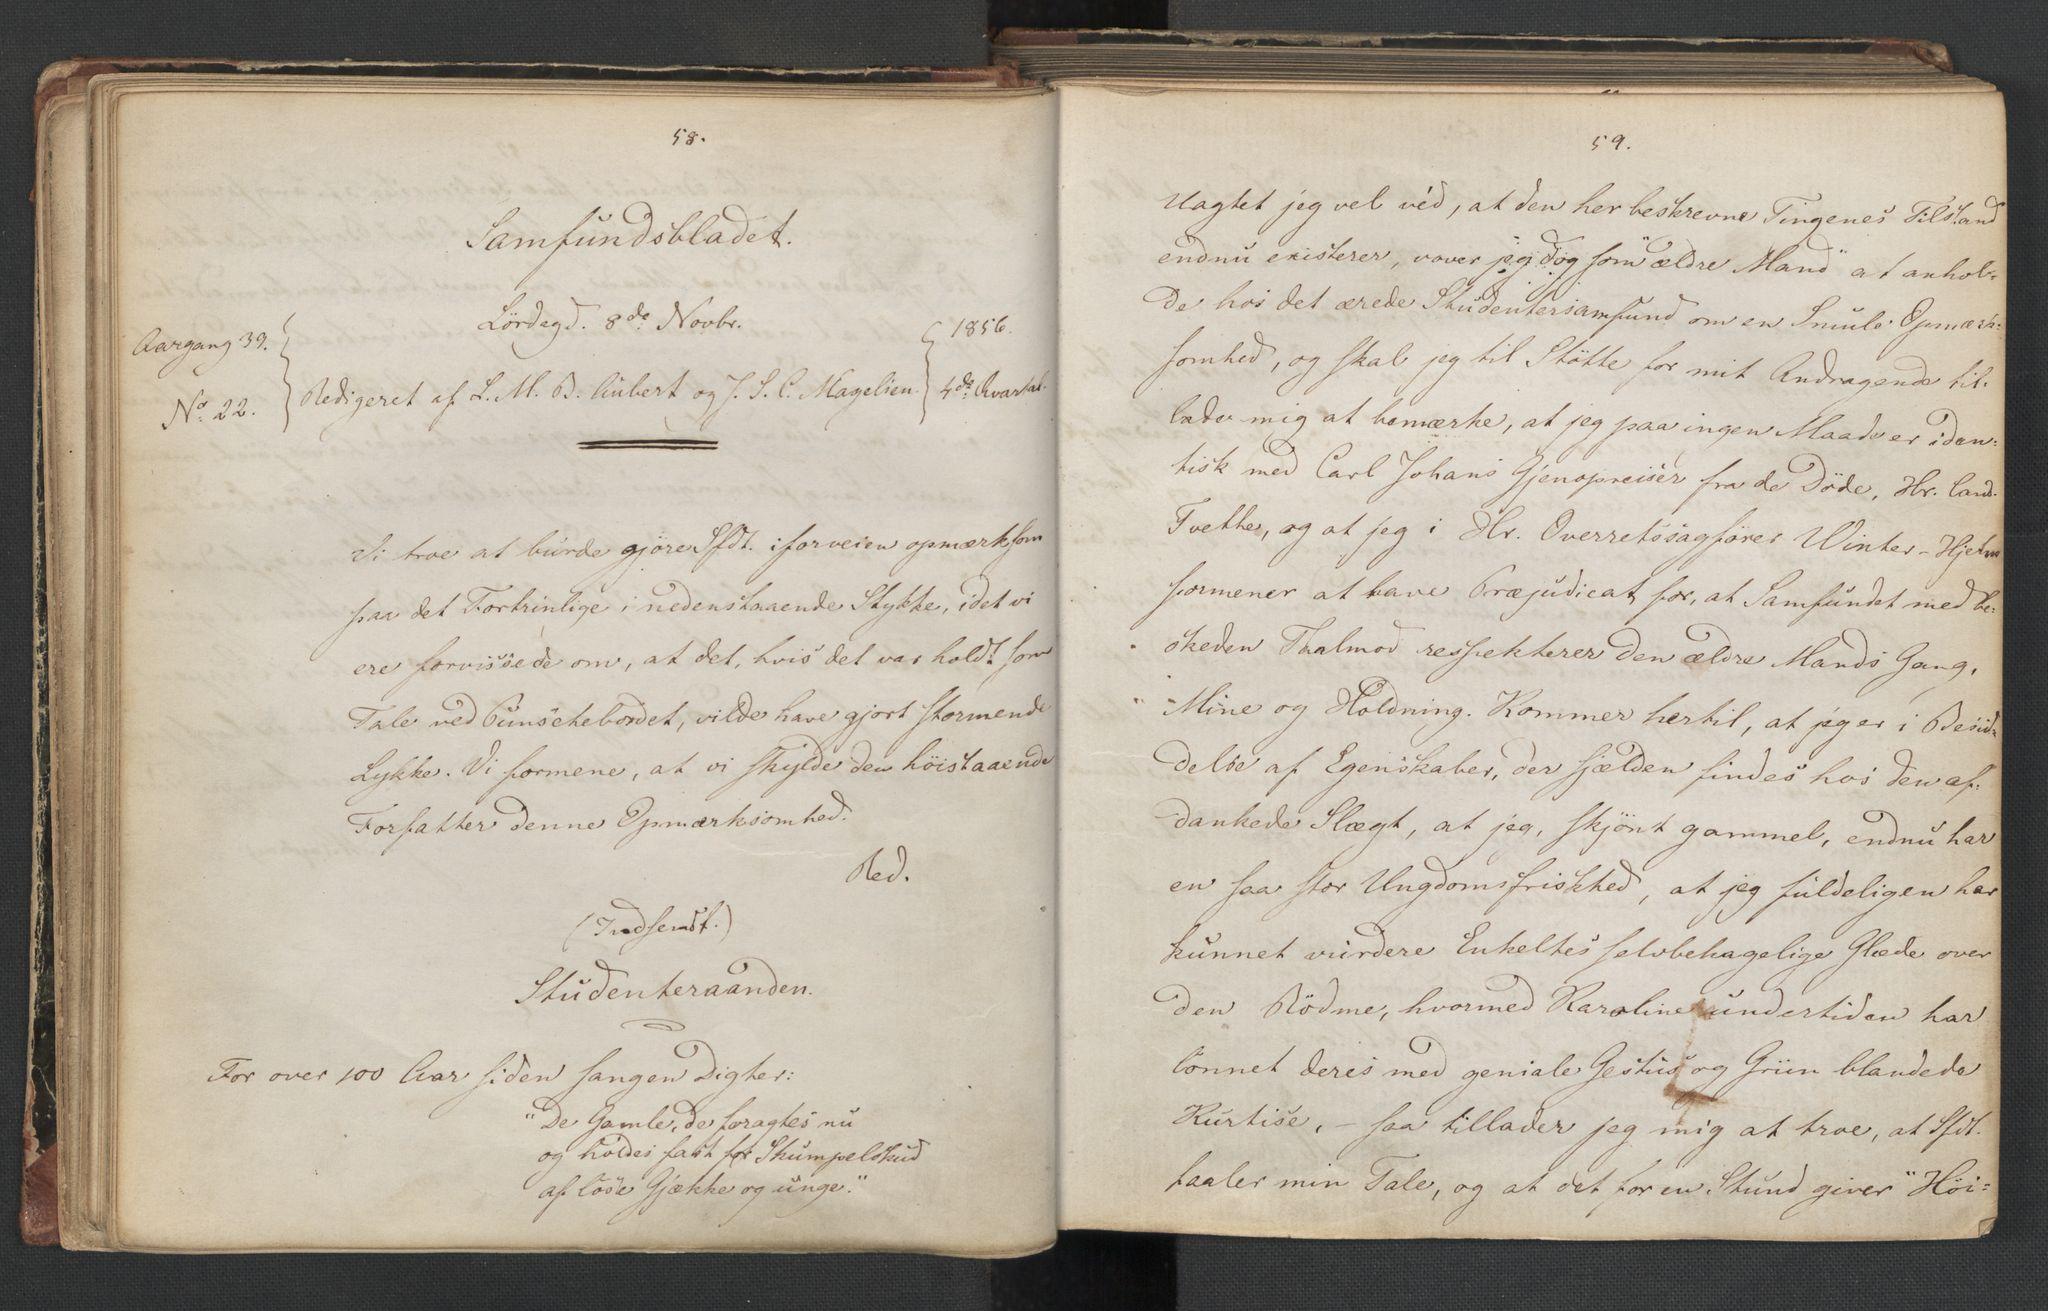 RA, Det Norske Studentersamfund, X/Xa/L0006, 1856-1857, s. 33